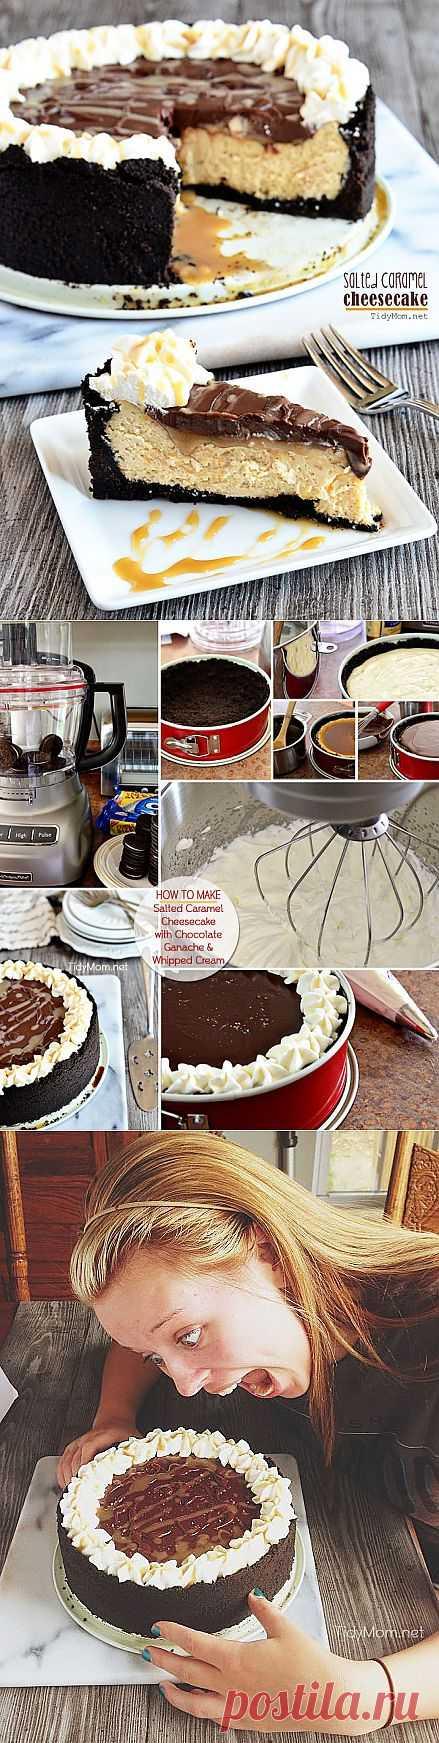 Salted Caramel Cheesecake Recipe | TidyMom